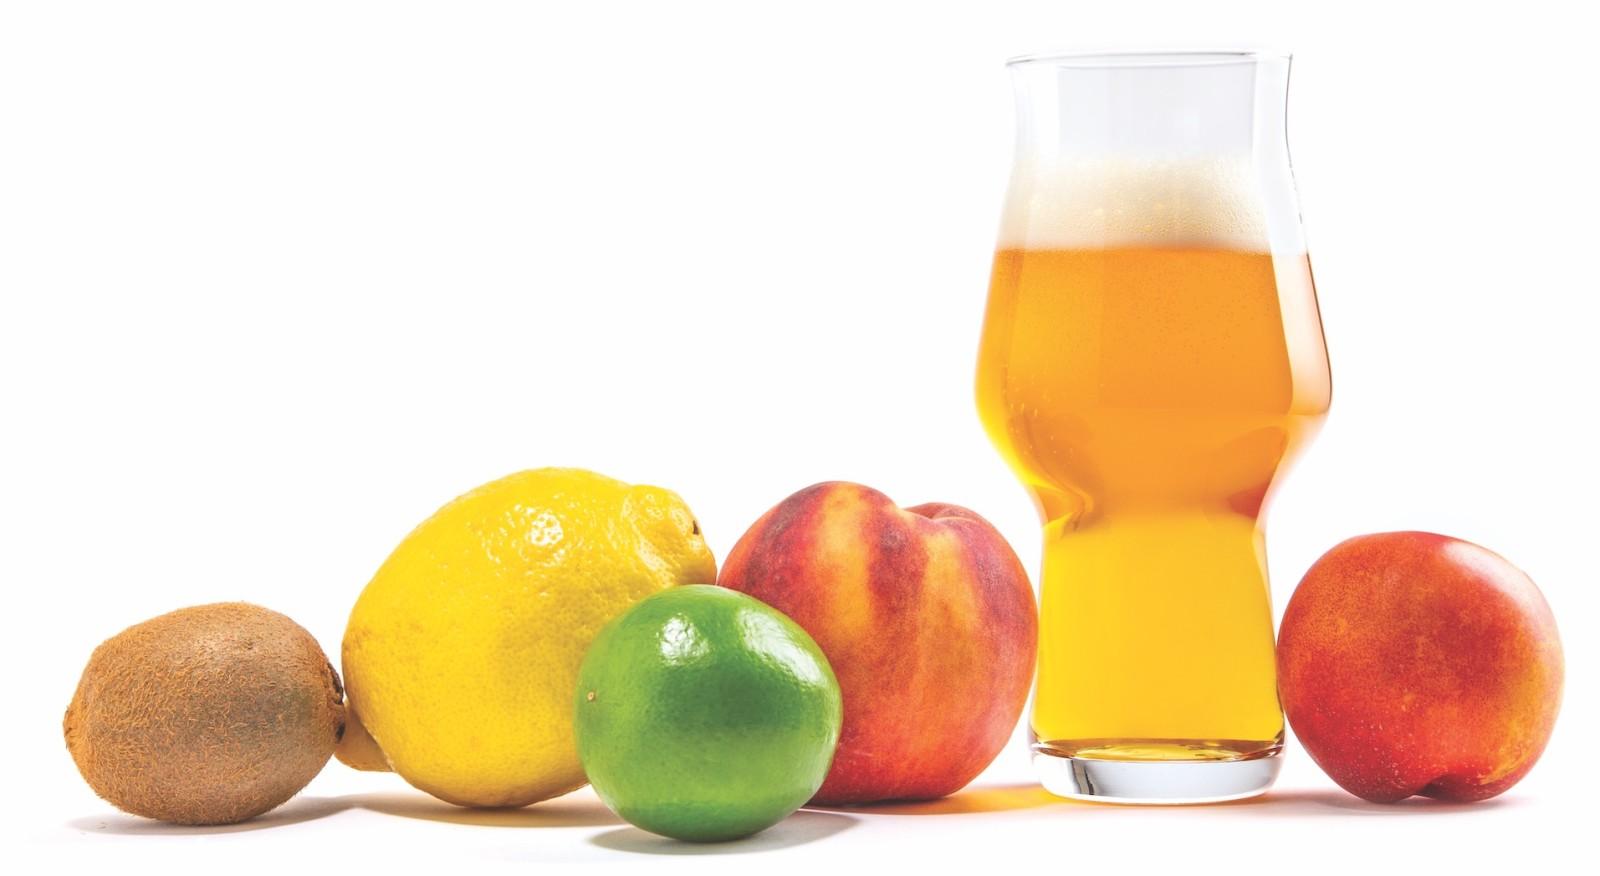 Make Juice, Not Haze: Refining the New England-style IPA